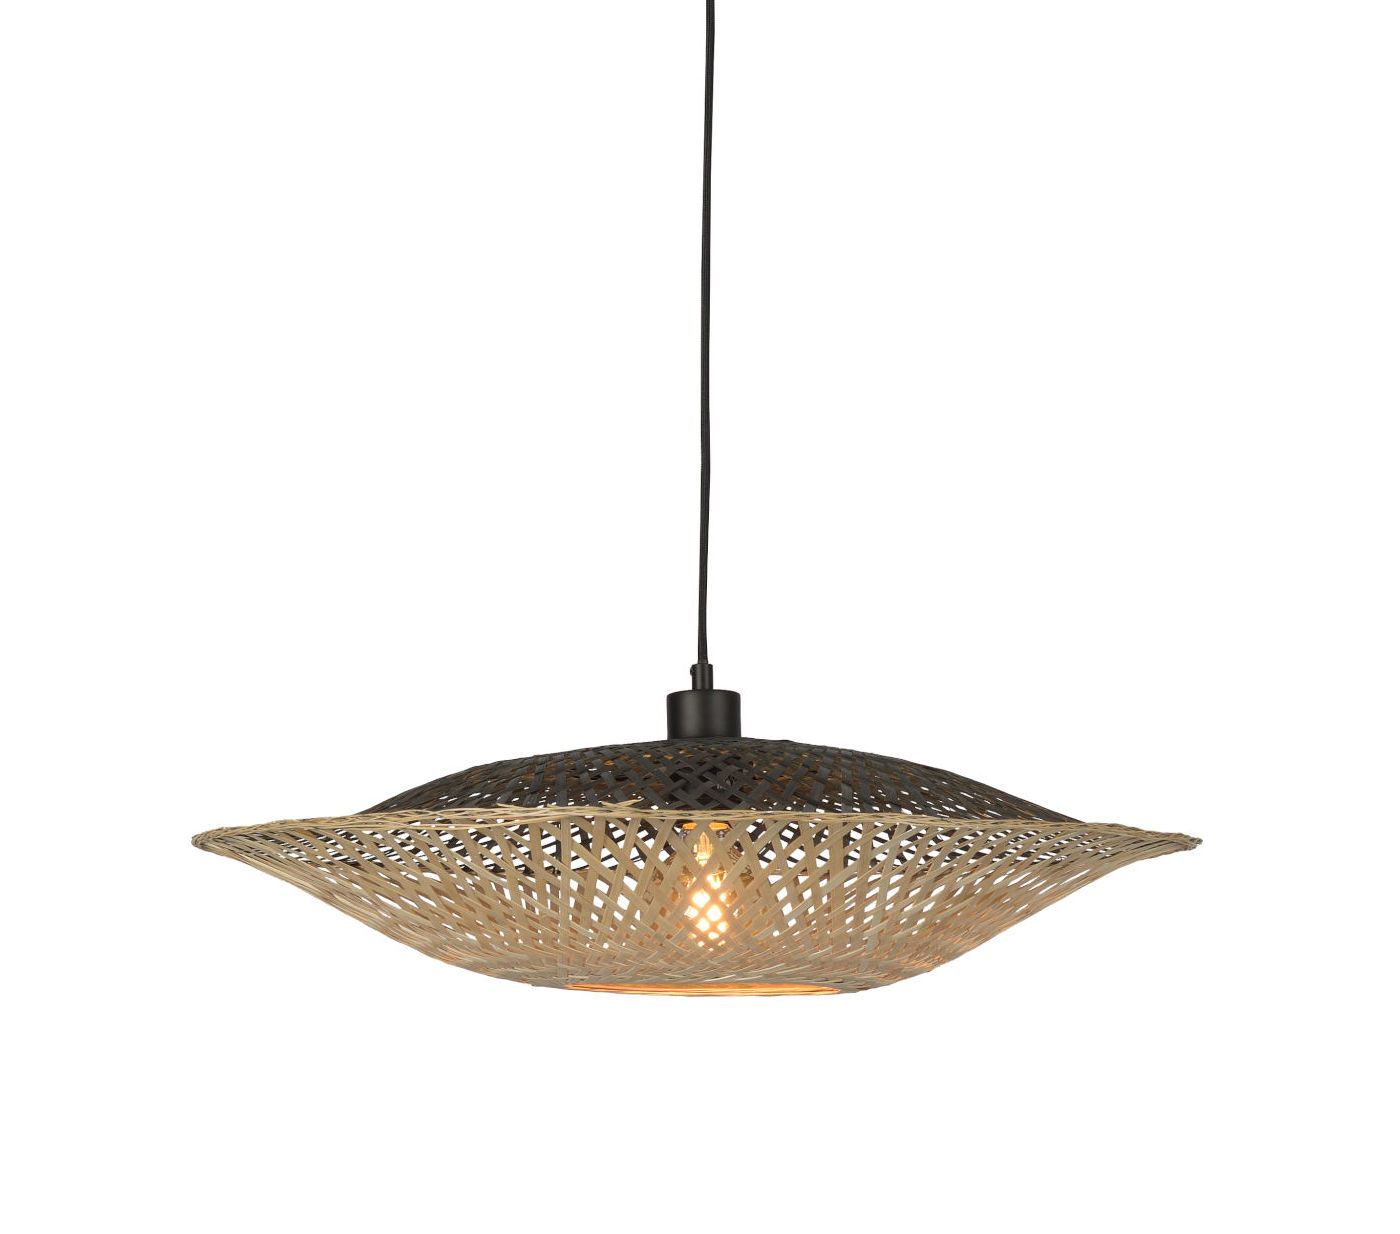 Lighting - Pendant Lighting - Kalimantan Flat Small Pendant - / Bamboo - Ø 60 cm by GOOD&MOJO - H 60 cm / Black & natural - Bamboo